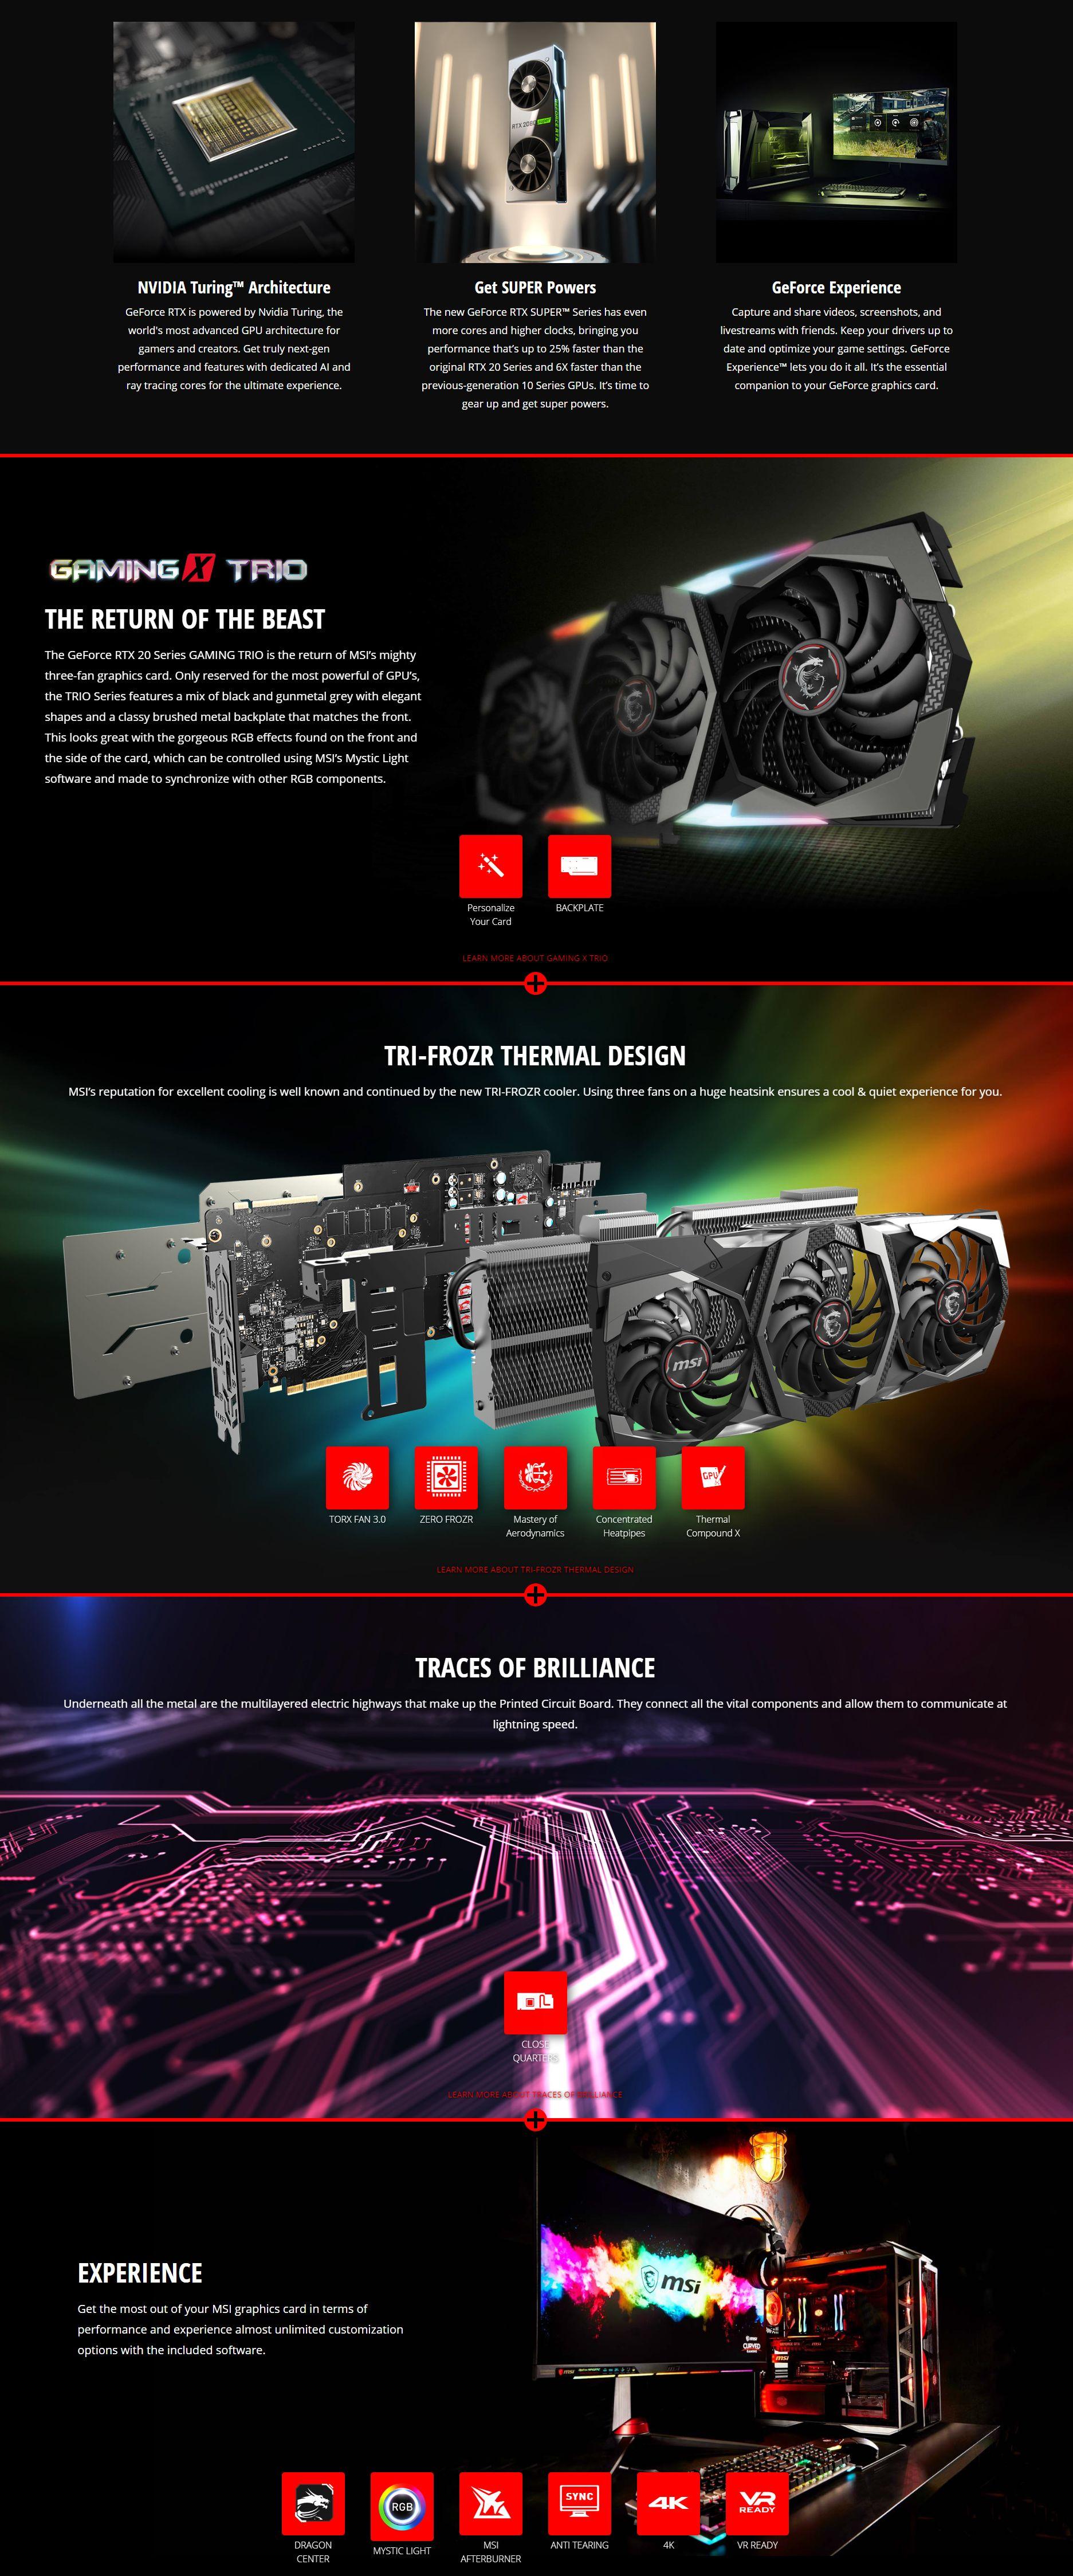 MSI Geforce RTX 2070 Super Gaming X Trio 8G Graphics Card